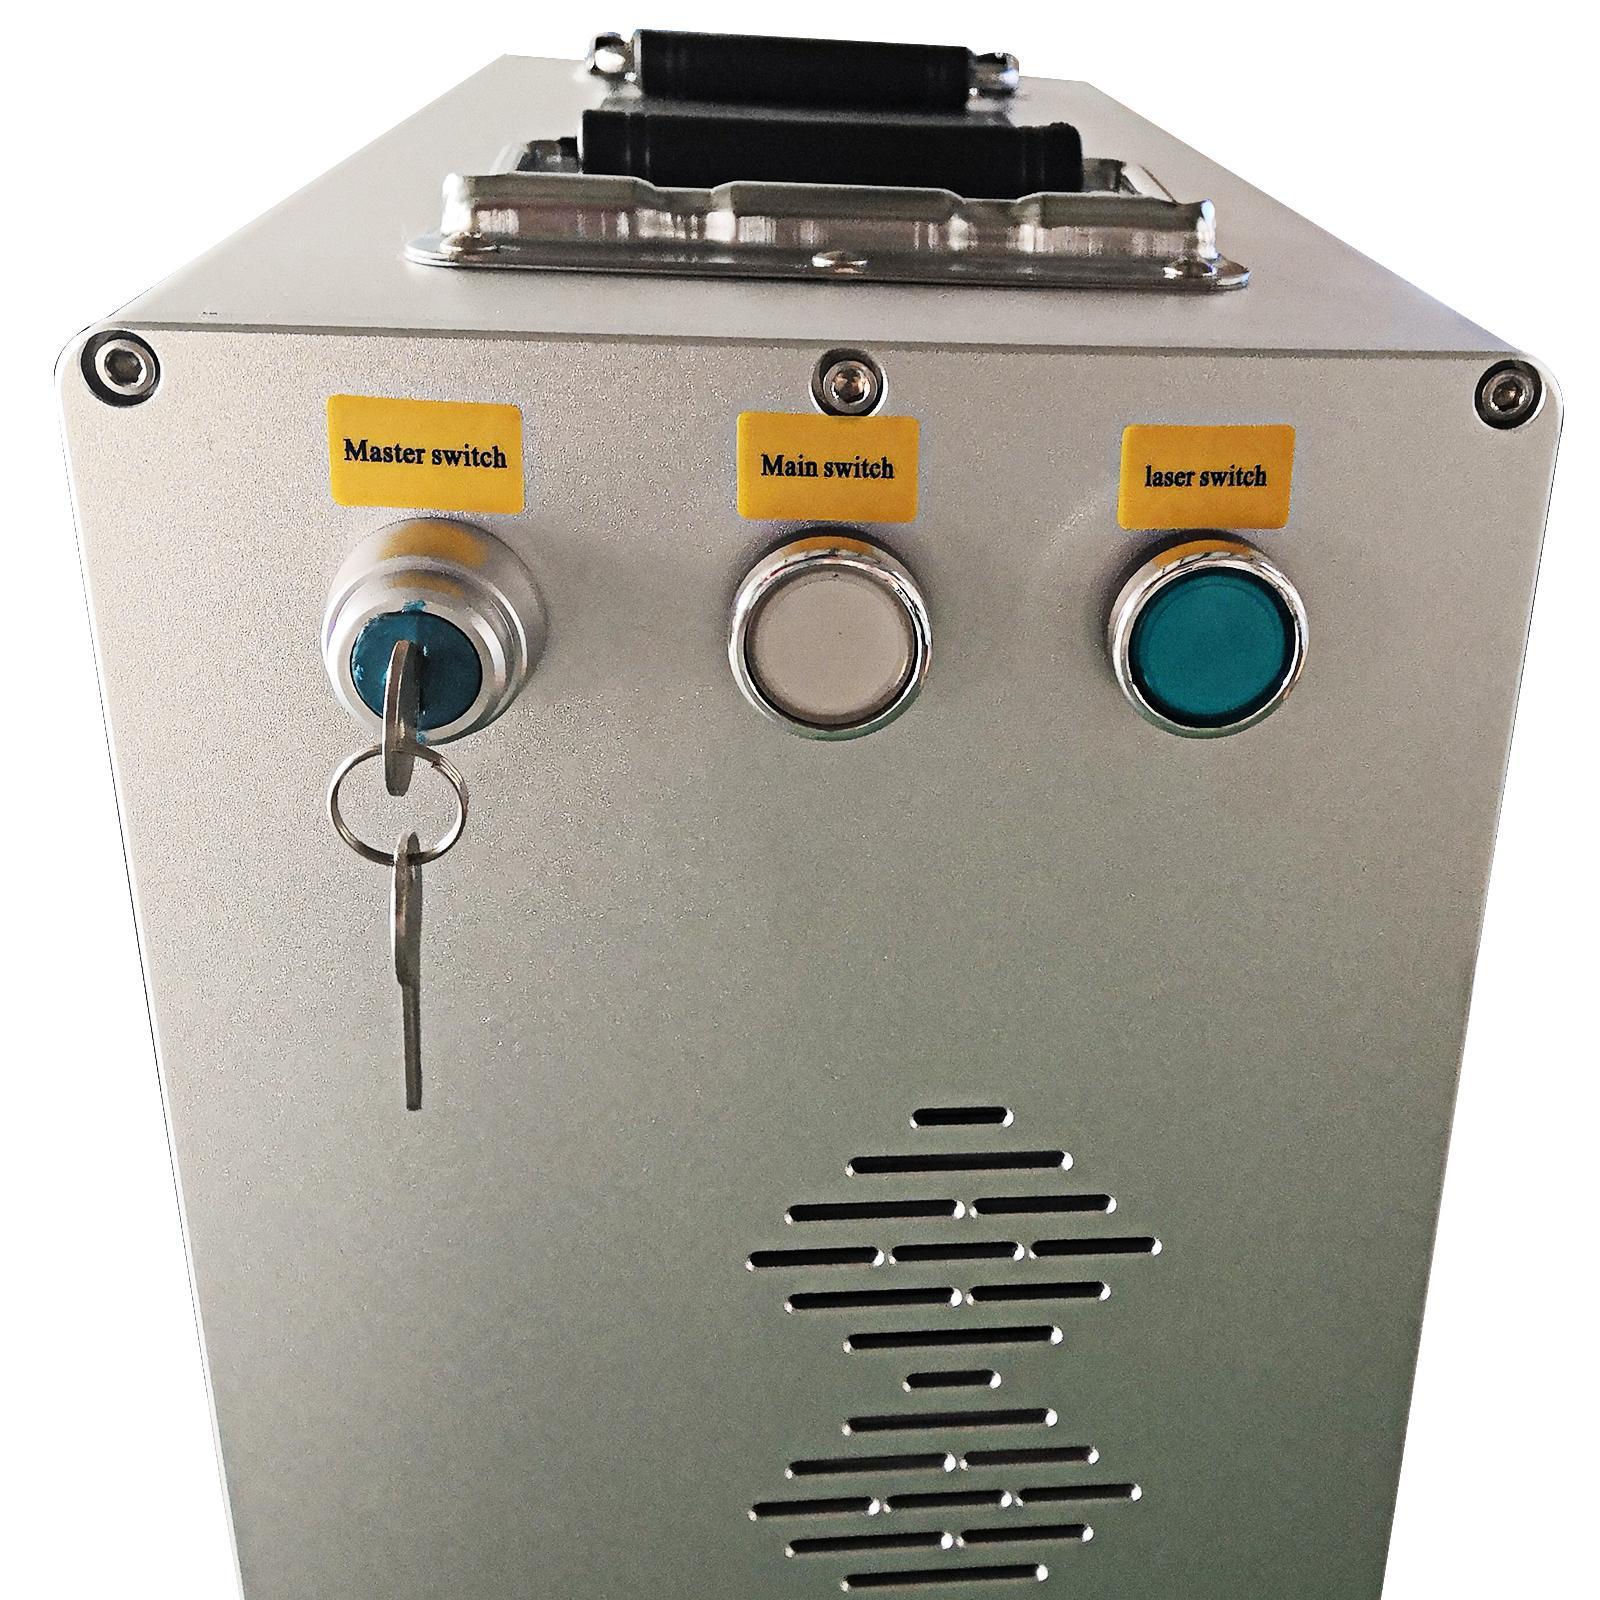 激光光纤打标机20W 30W 50W 激光打标机 4